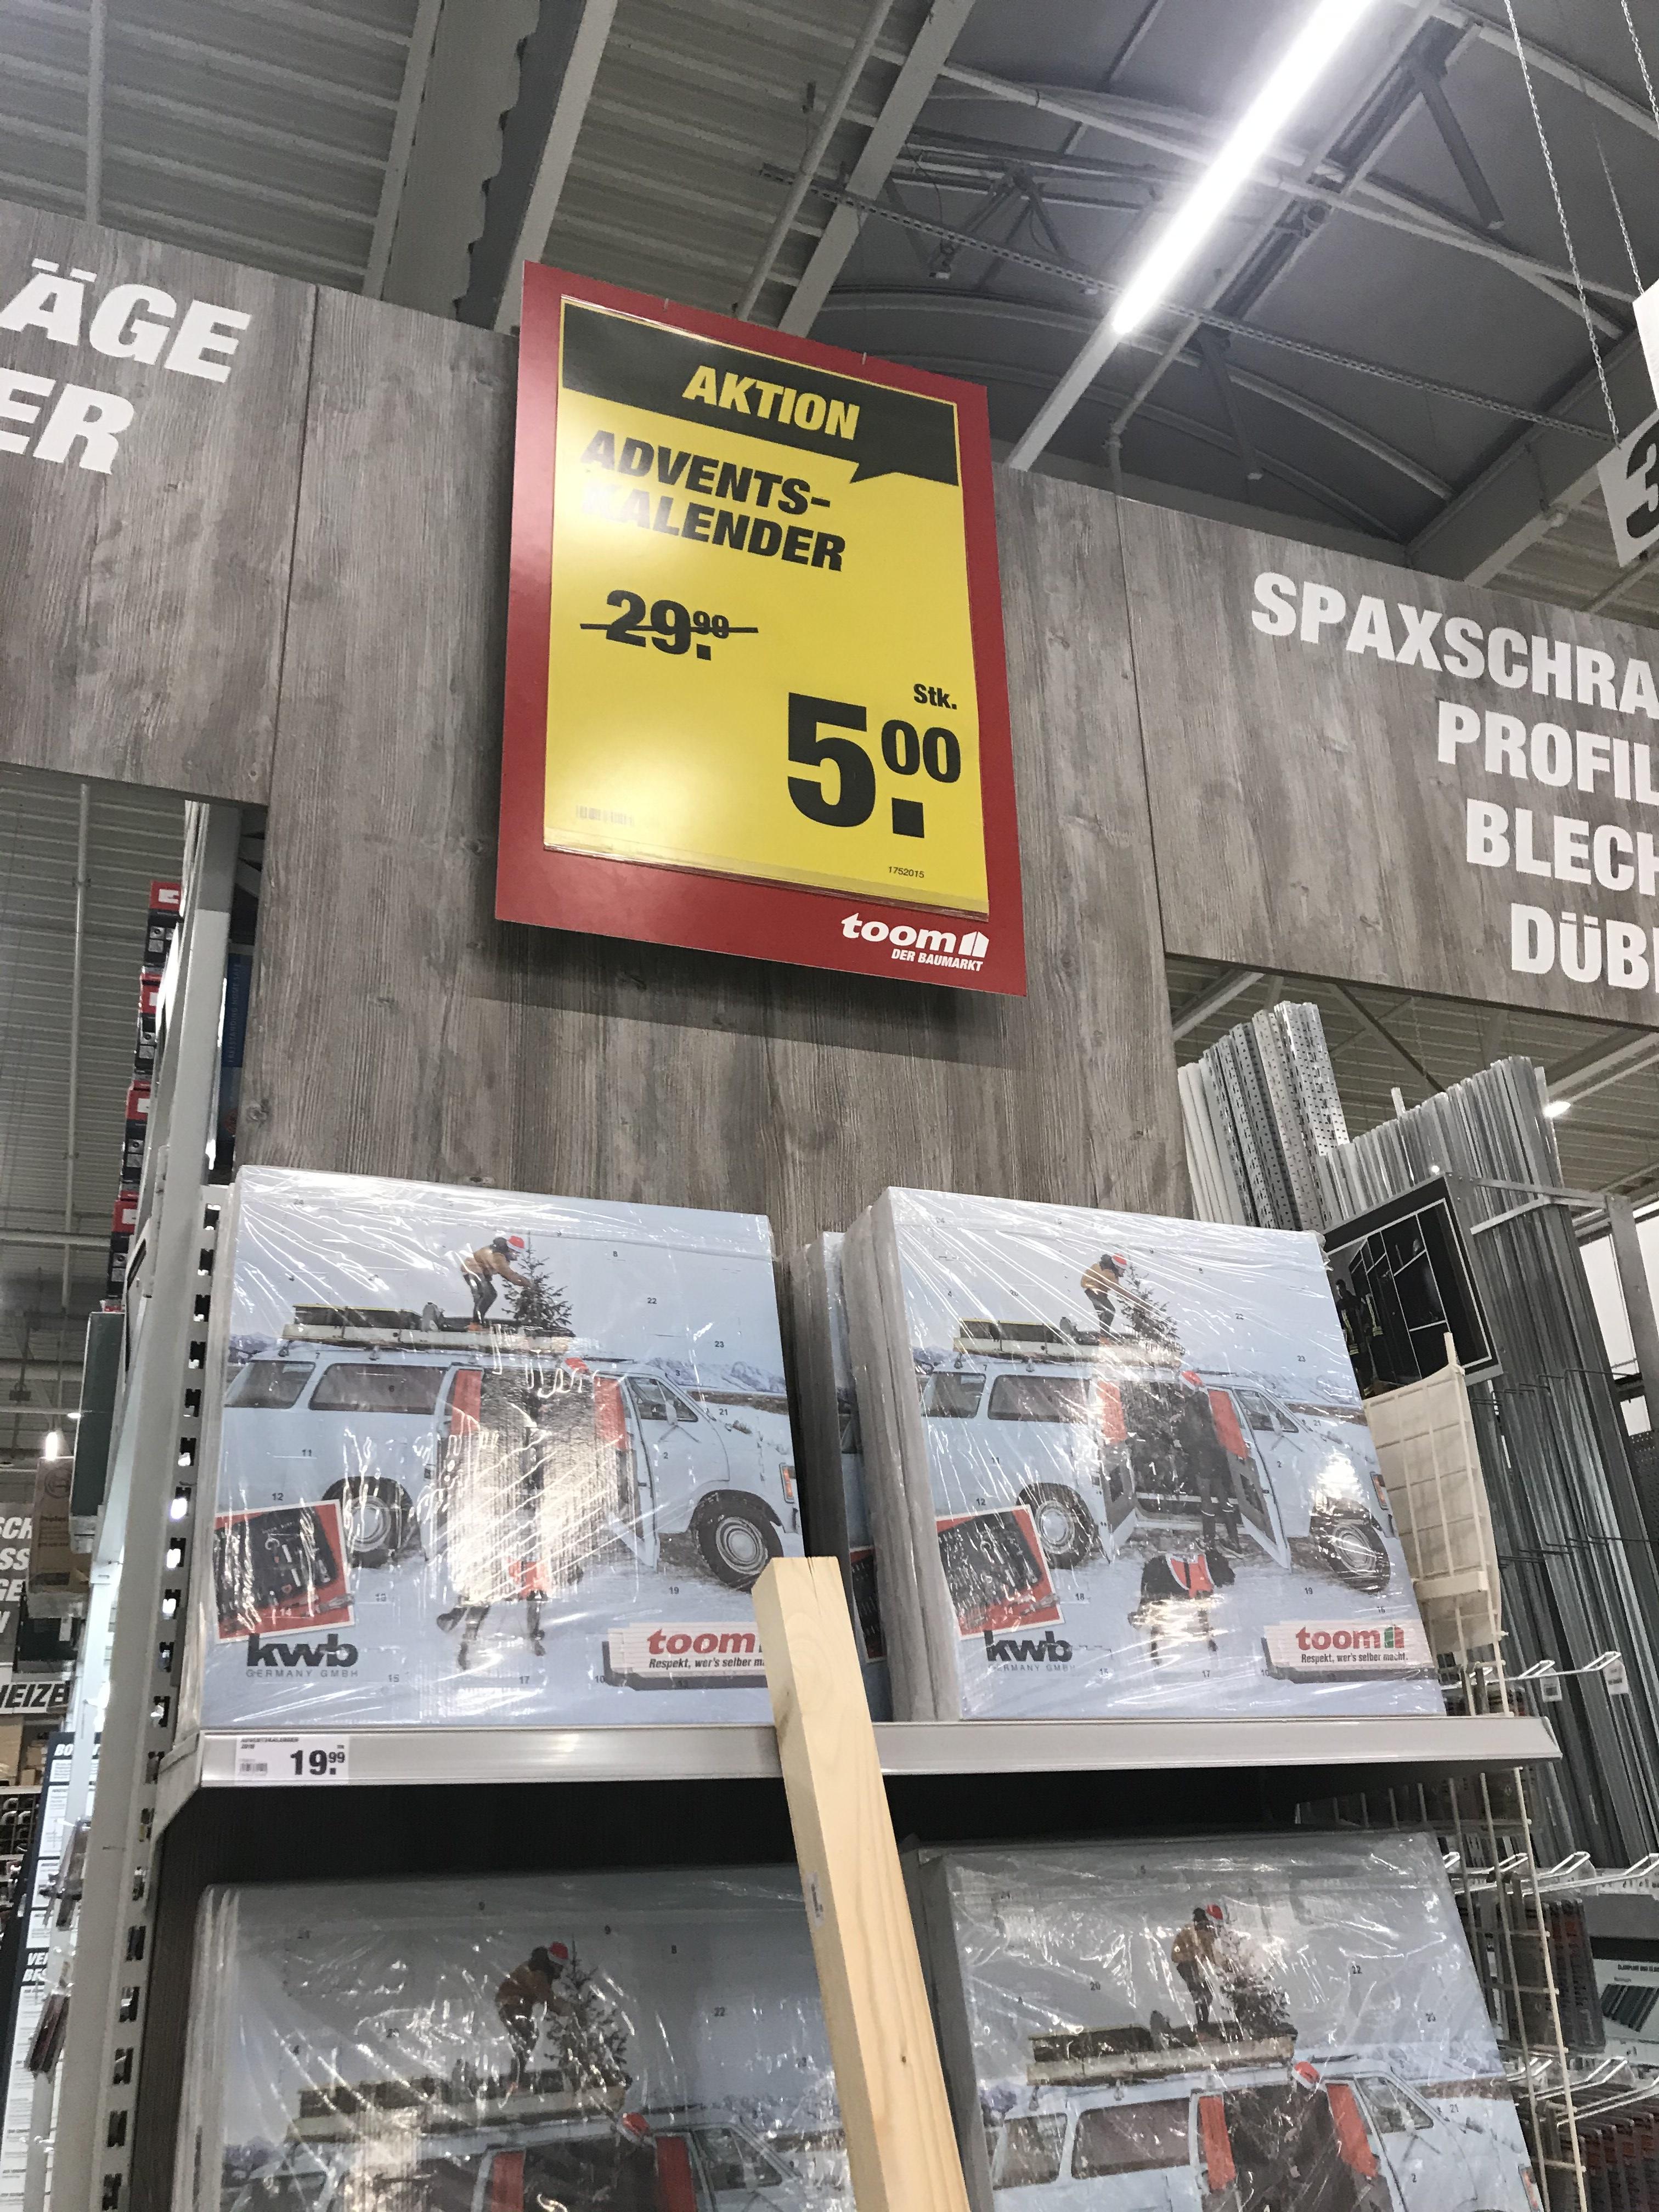 KWB Adventskalender für 5,00€ bei toom Leipzig Plagwitz (lokal?)